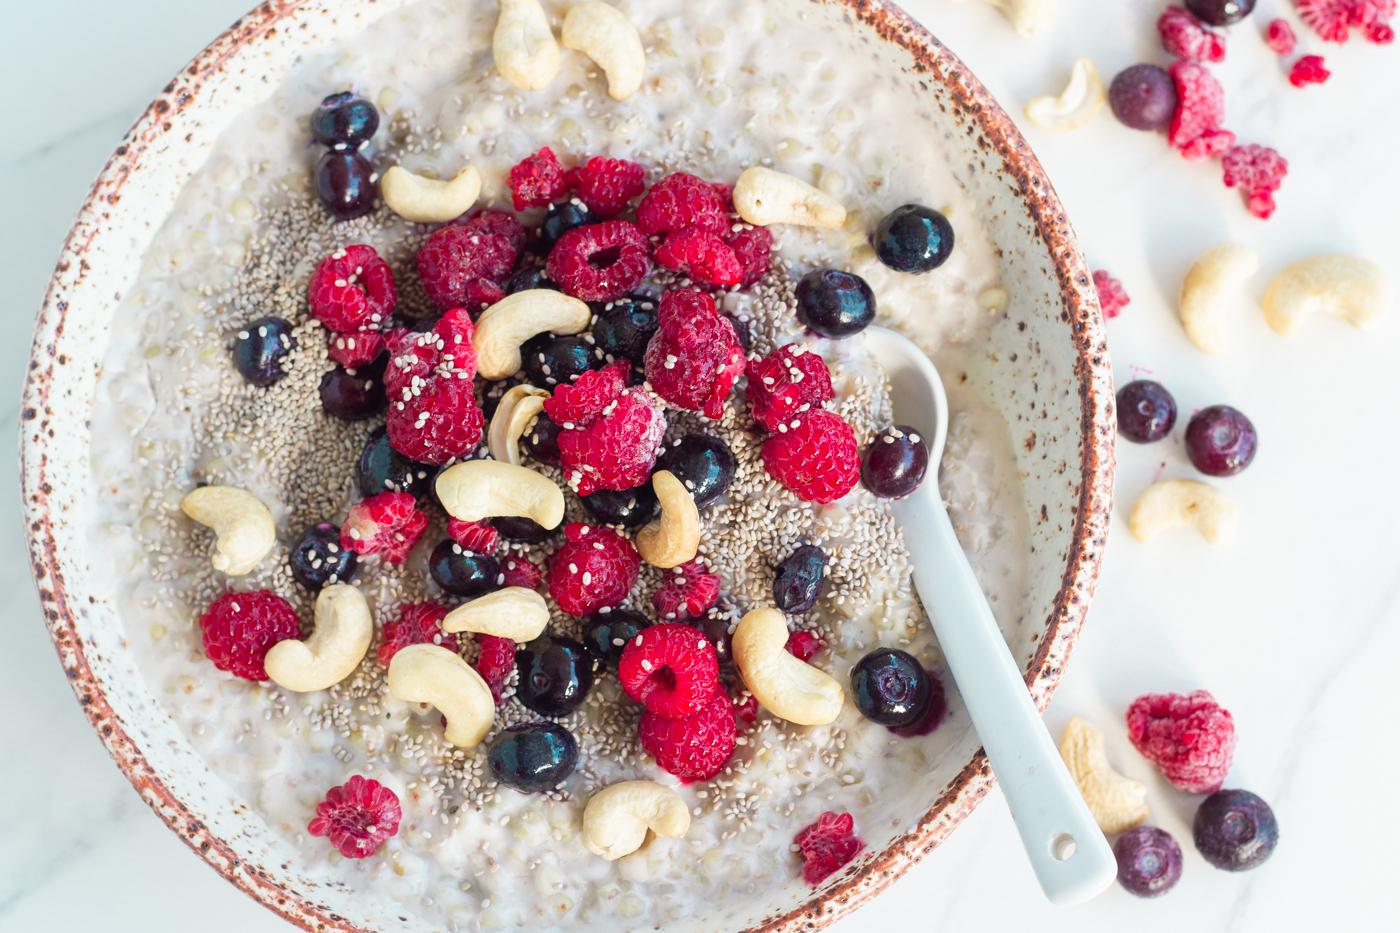 bowl of berry buckwheat